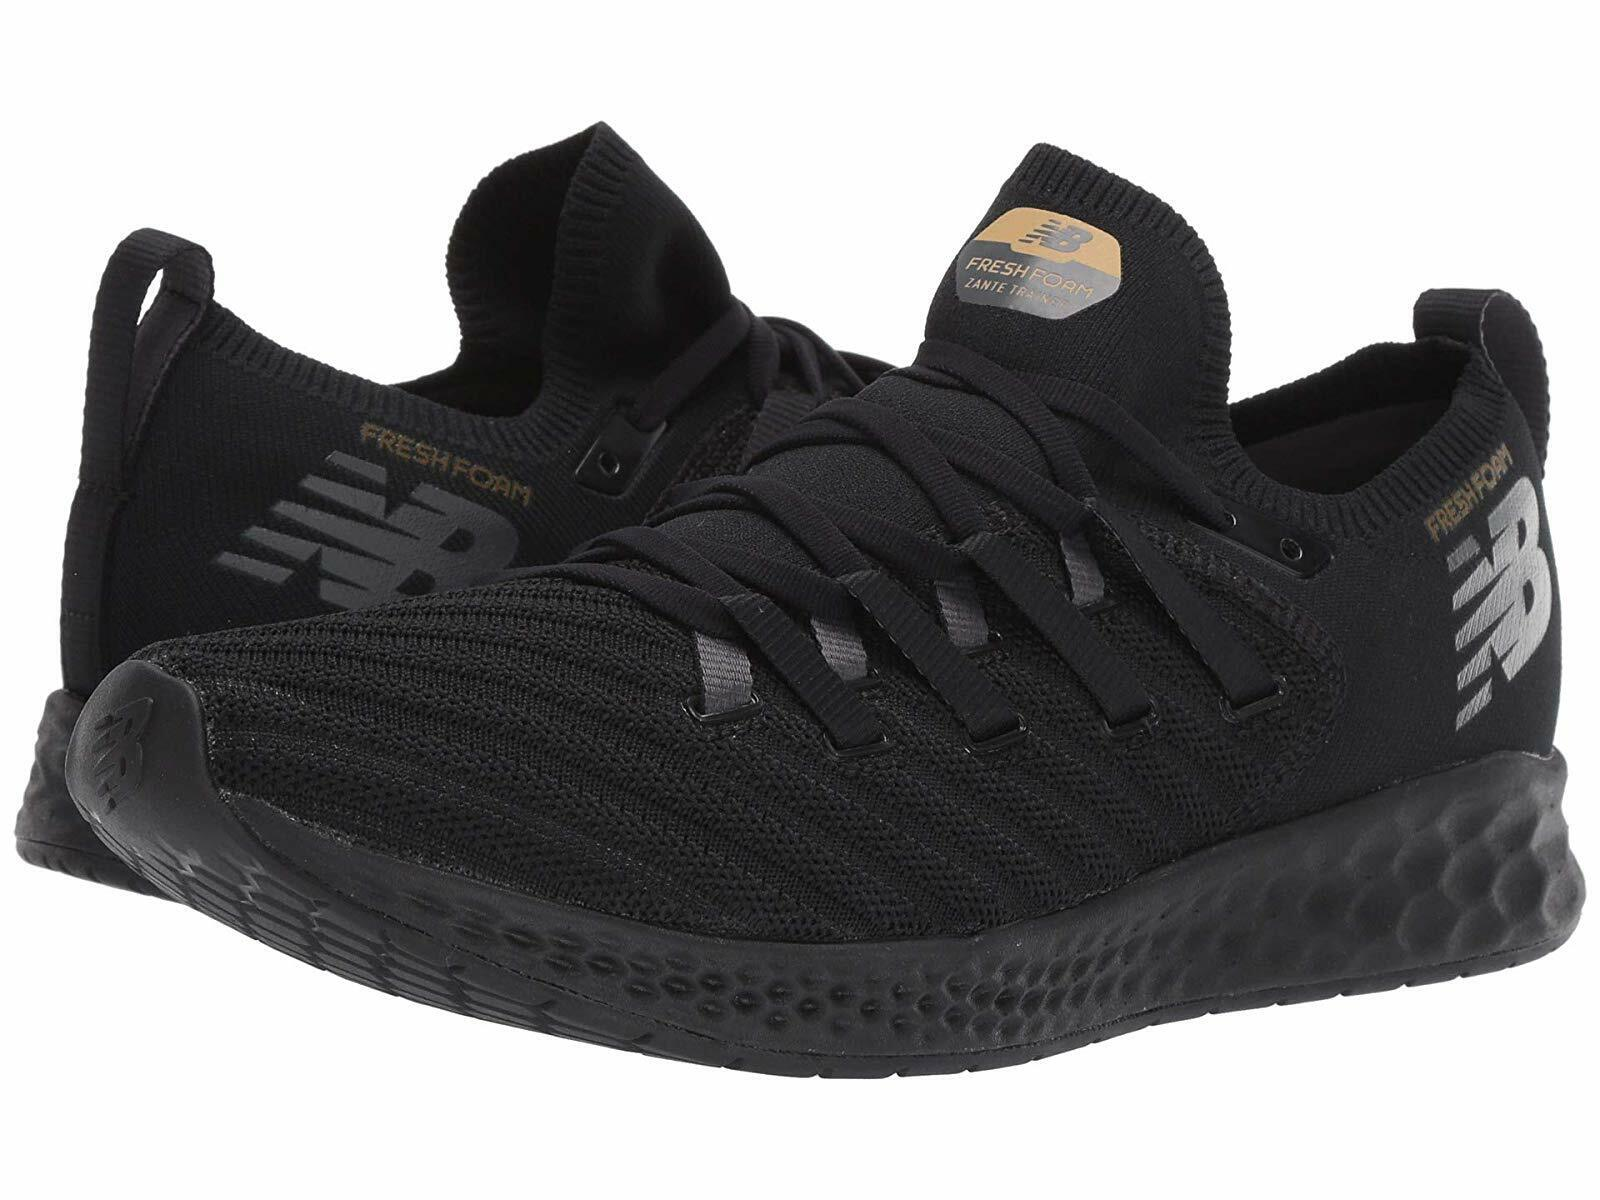 Homme Baskets & chaussures de sport New Balance Fresh Foam Zante Trainer